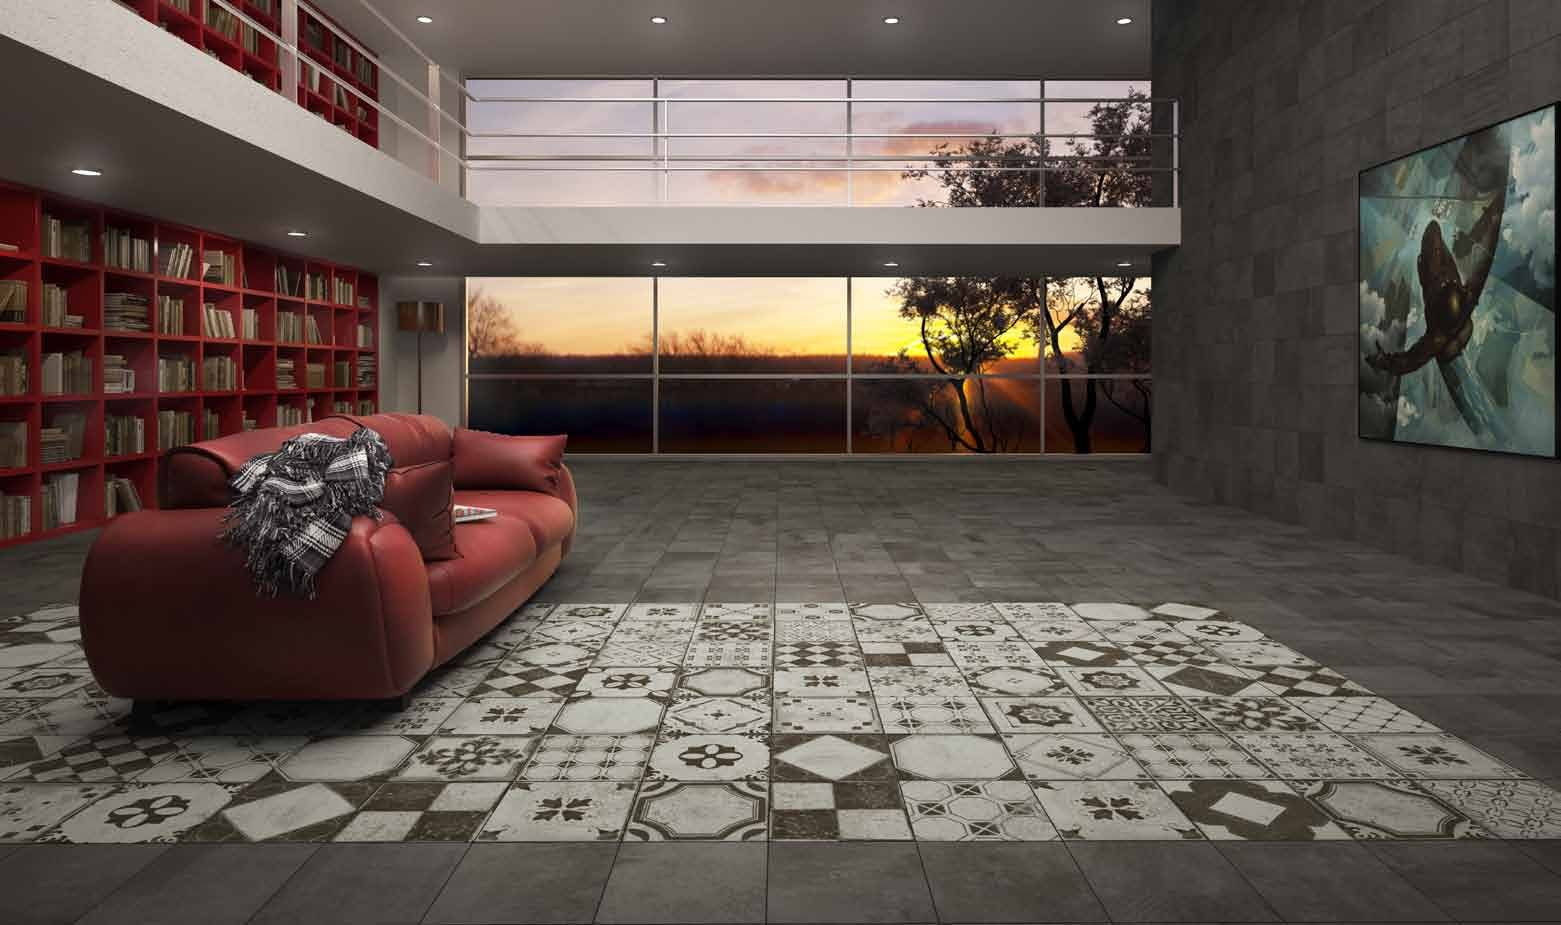 Patterned square tile rug in a living room